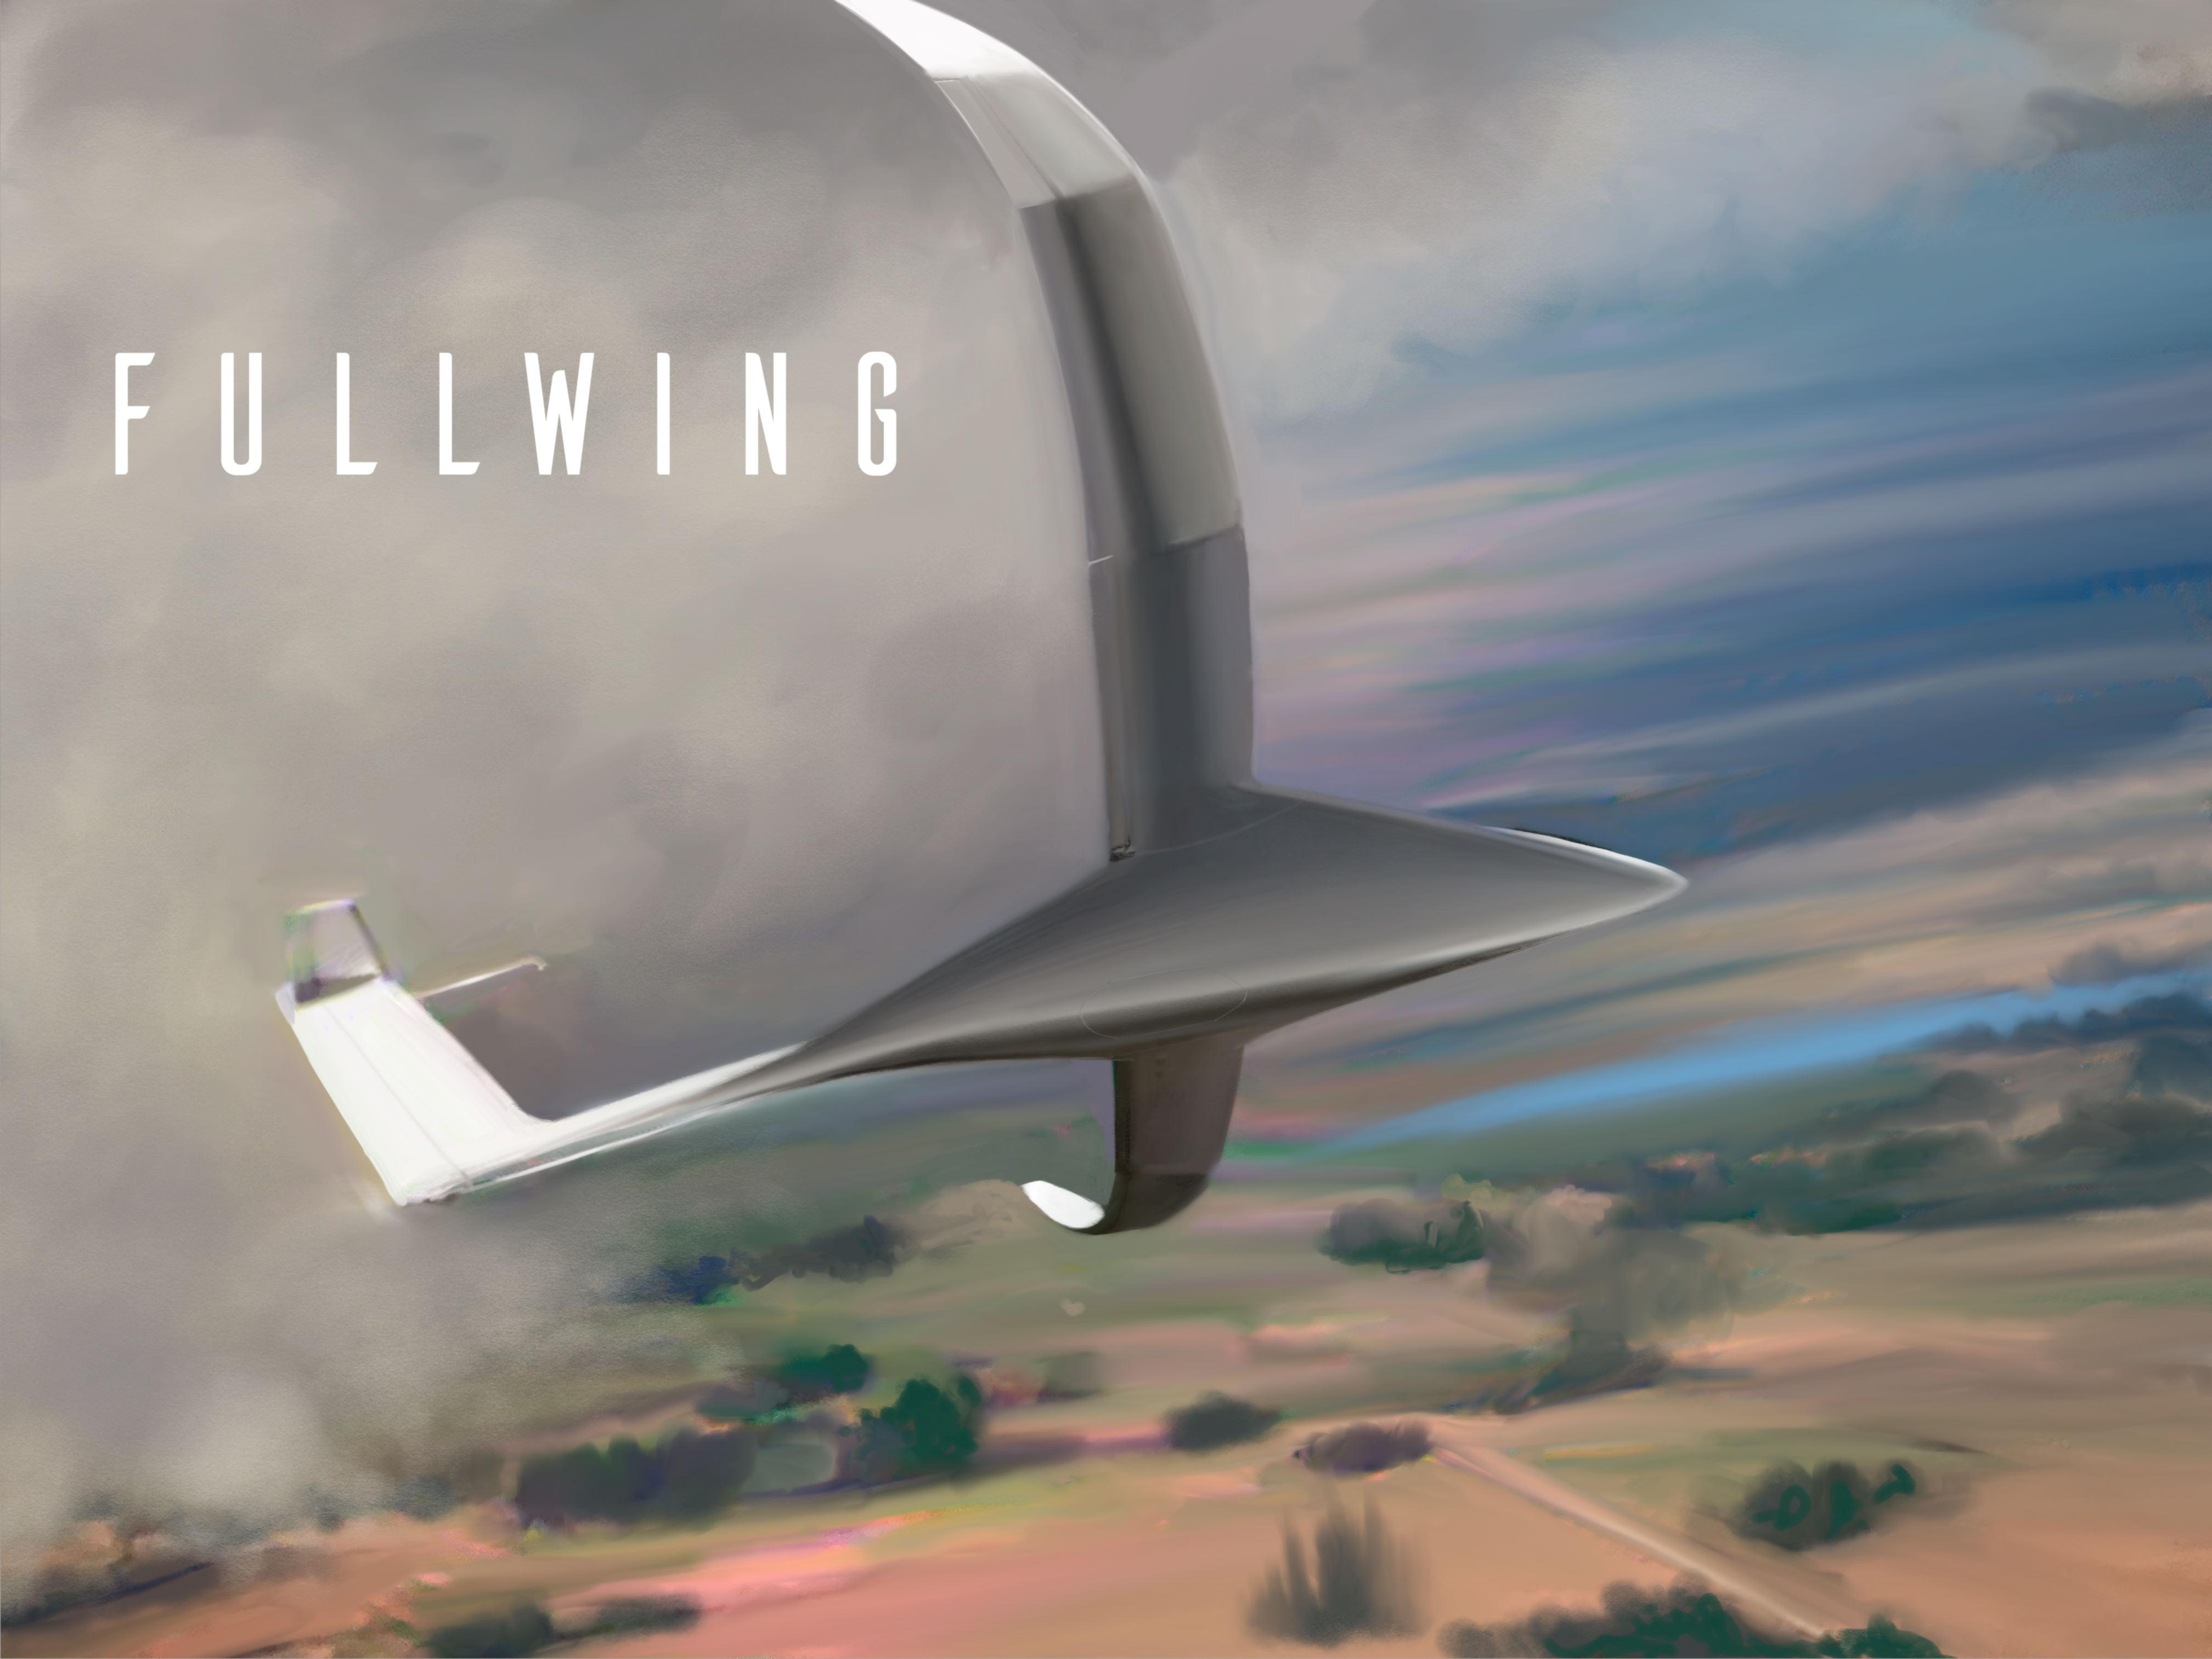 FullWing-2018-13.5.jpg